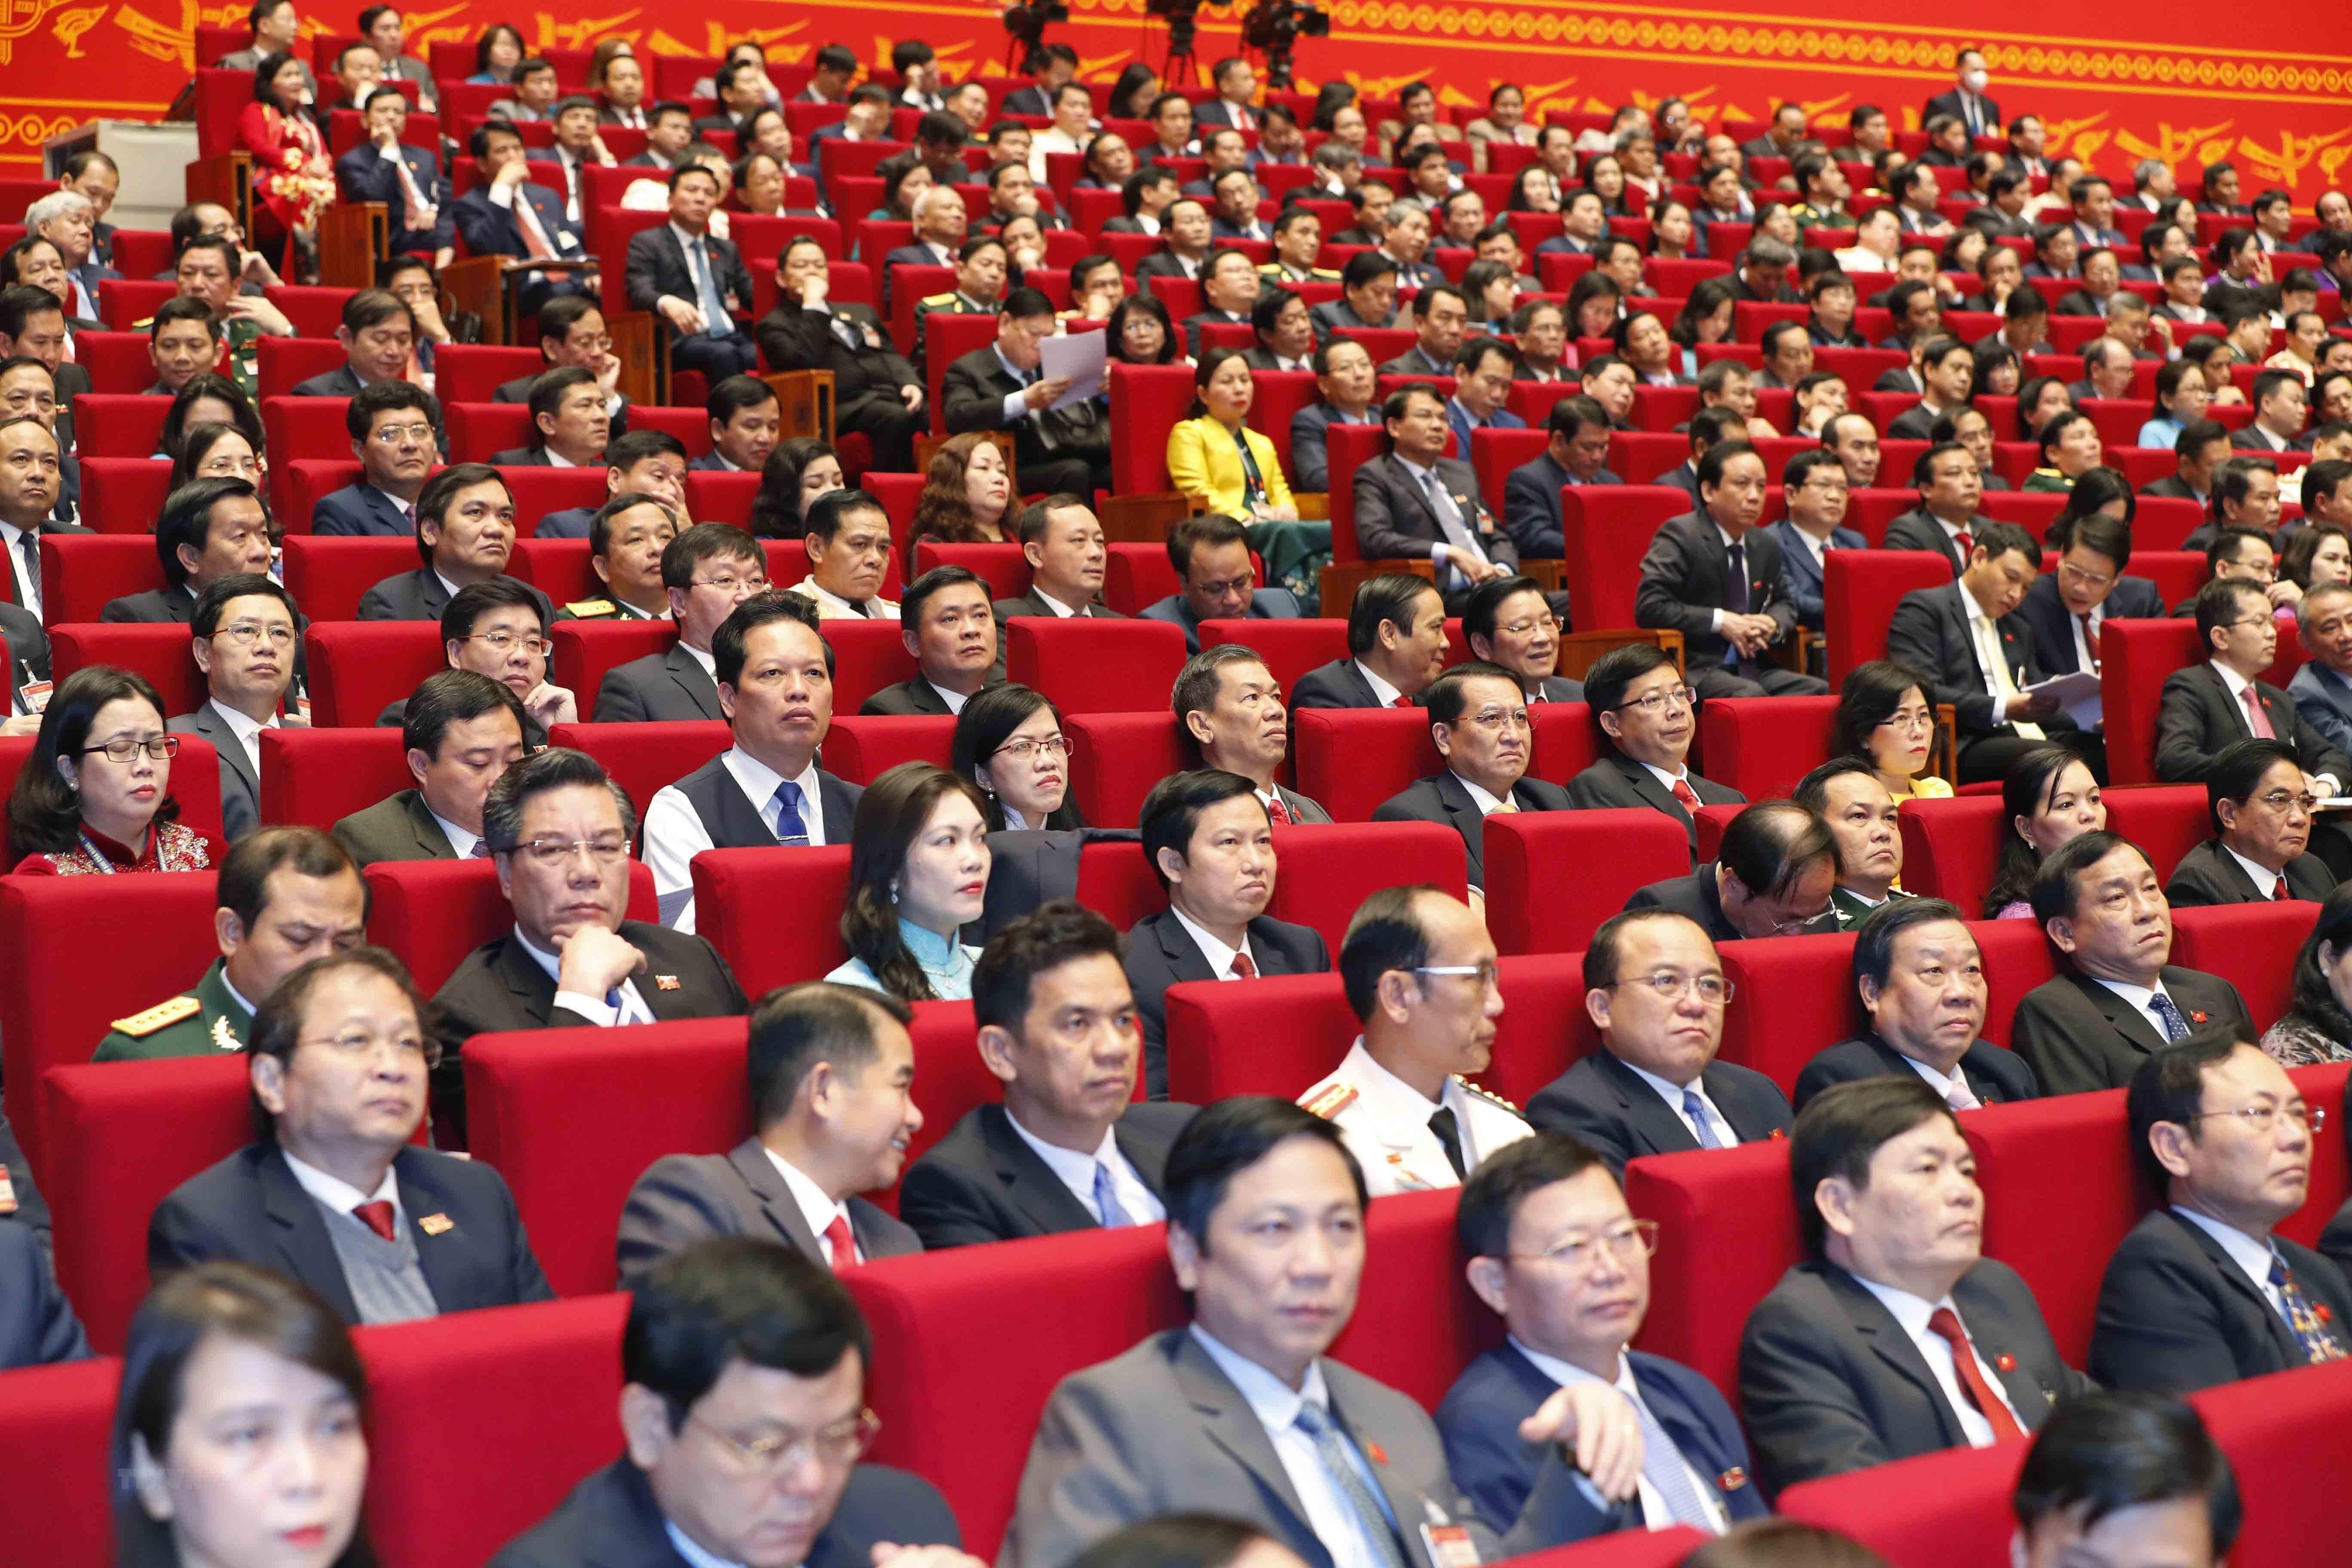 [Photo] Quang canh phien thao luan cac van kien Dai hoi XIII cua Dang hinh anh 18